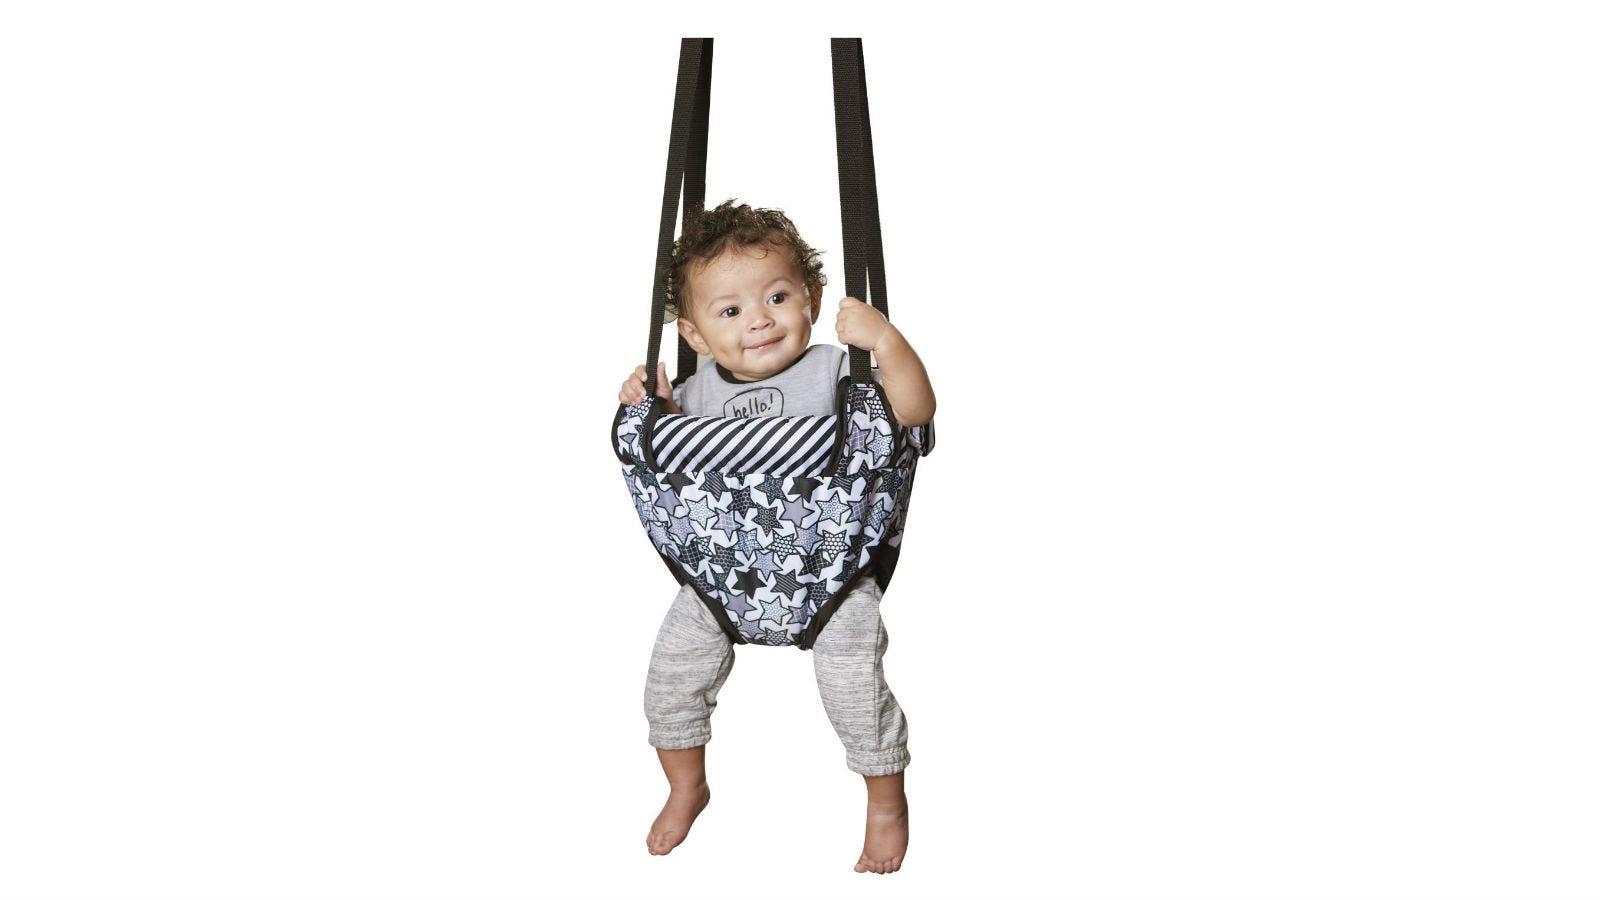 A toddler in an Evenflo Doorway Jumper.